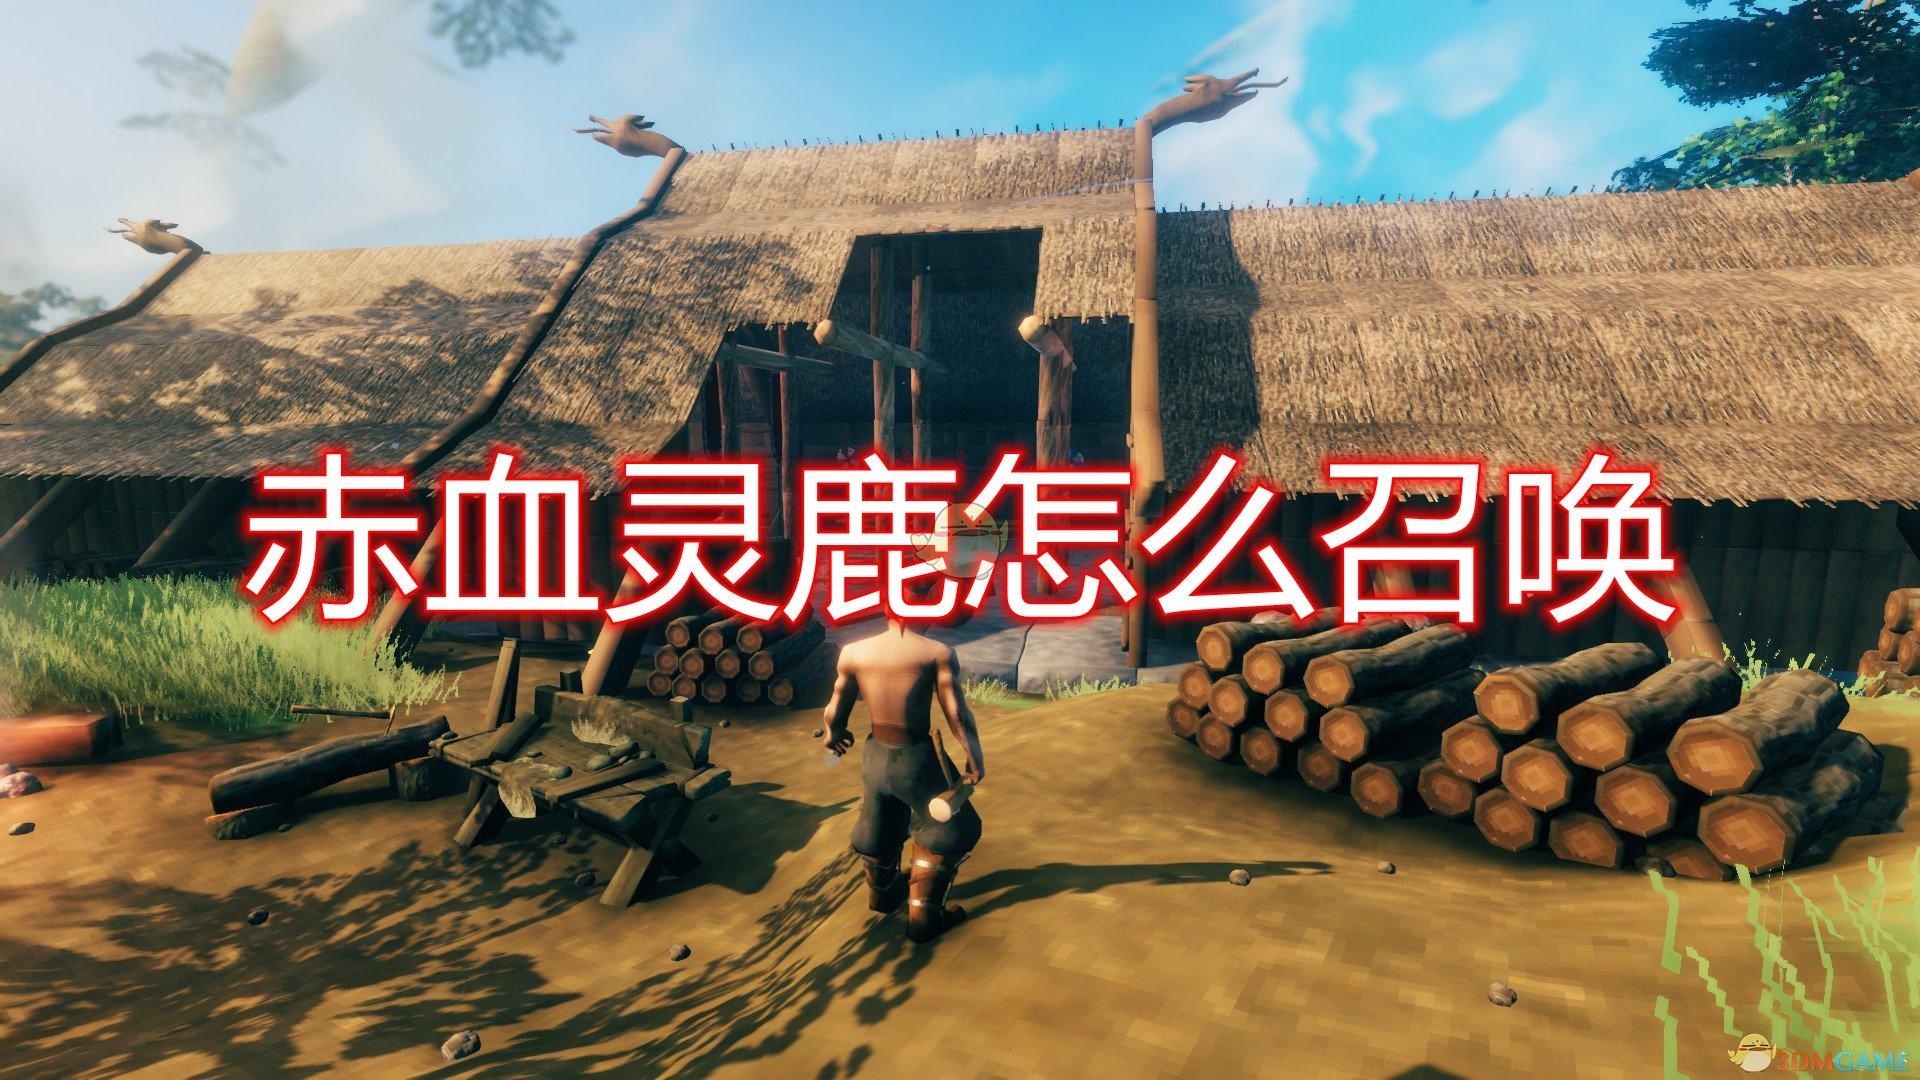 《Valheim:英灵神殿》赤血灵鹿召唤方法介绍